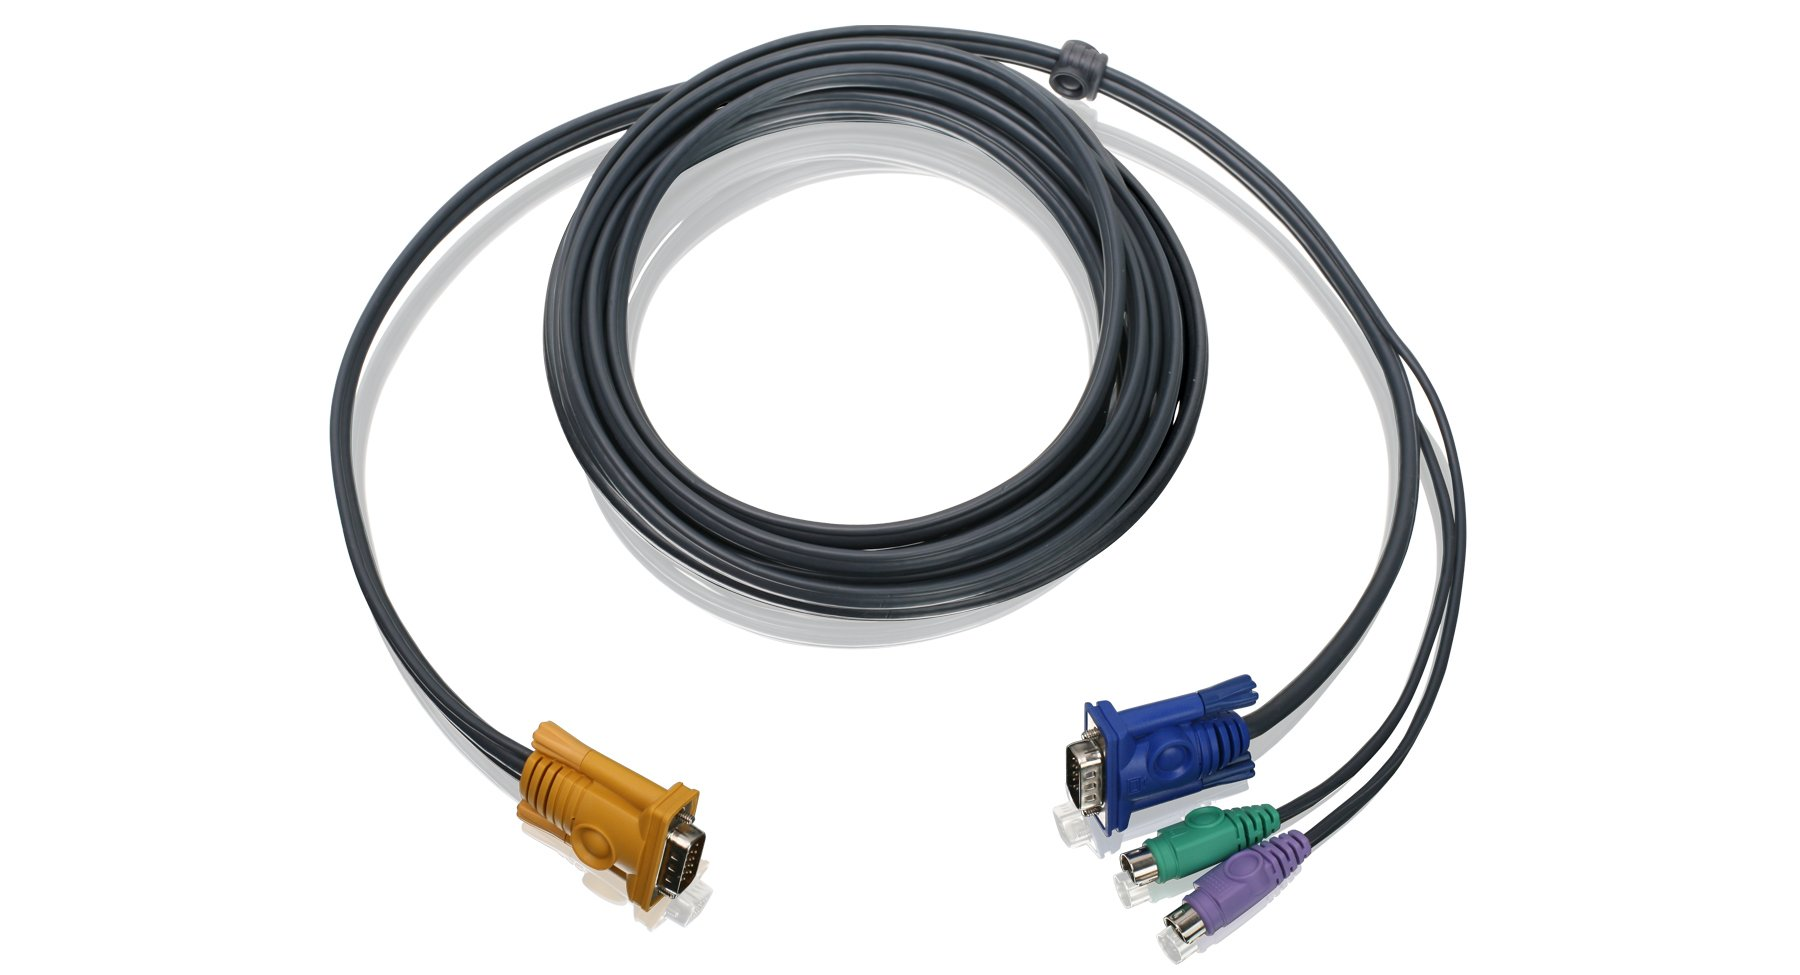 IOGEAR PS/2 KVM Cable, 10 Feet, G2L5203P